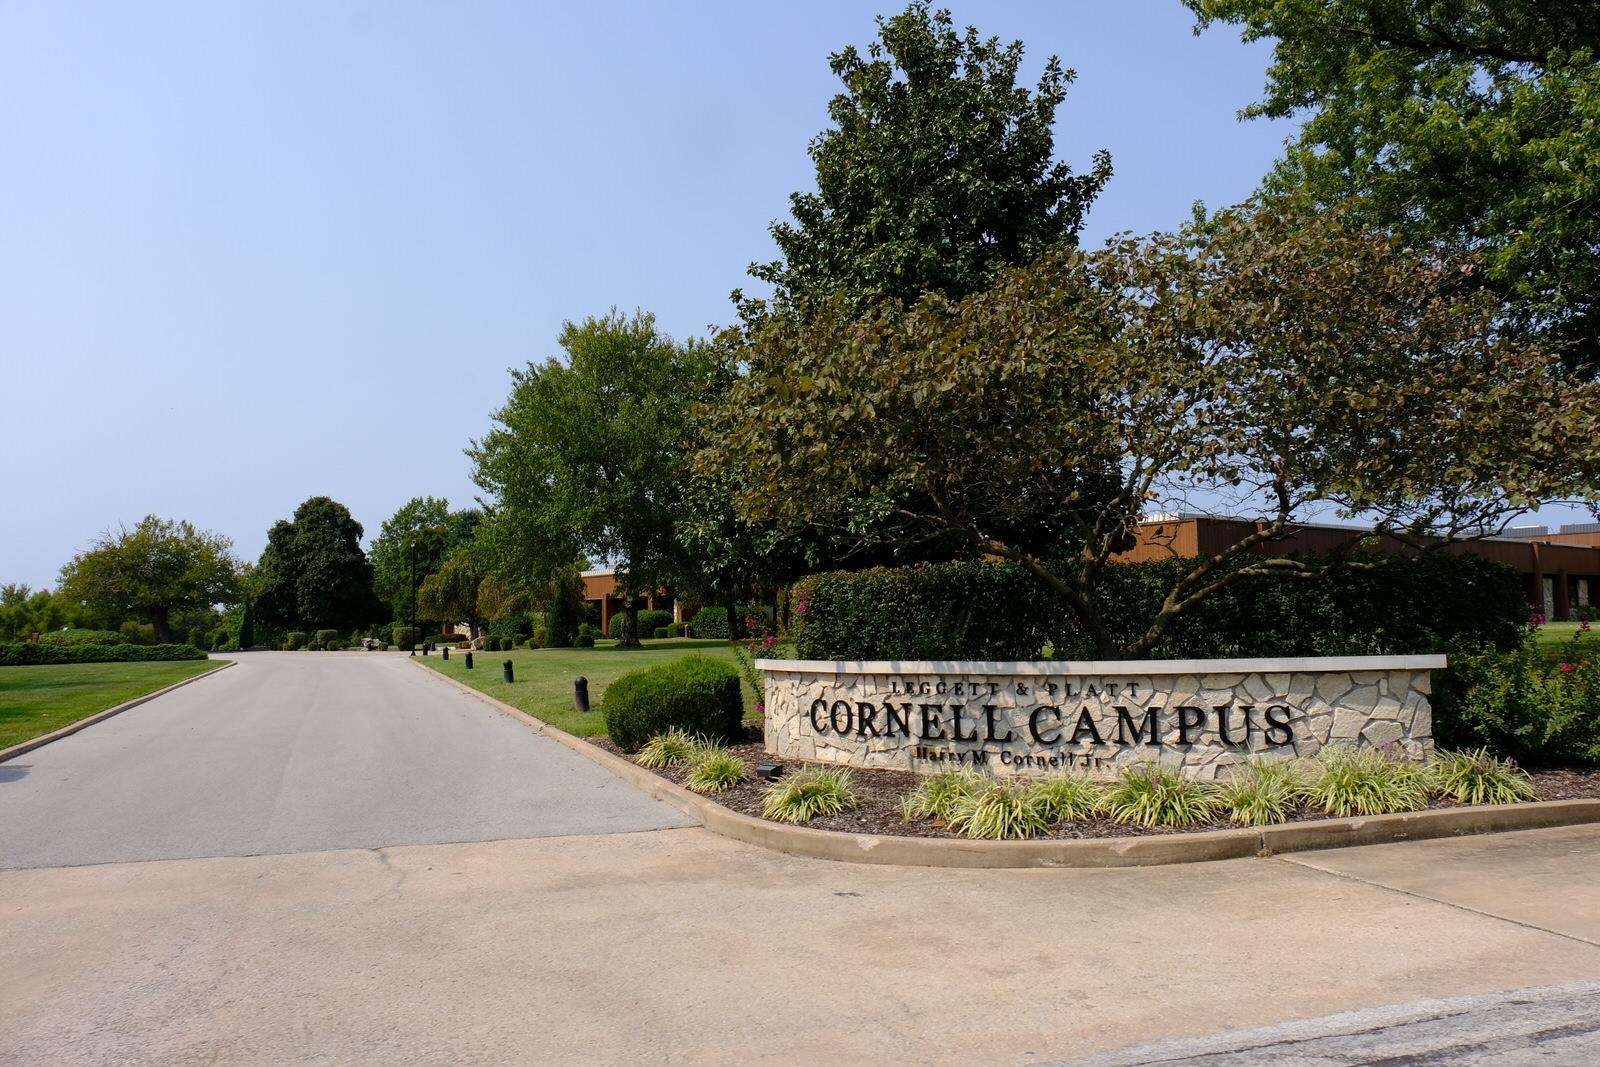 Leggett & Platt's corporate headquarters in Carthage, Missouri.